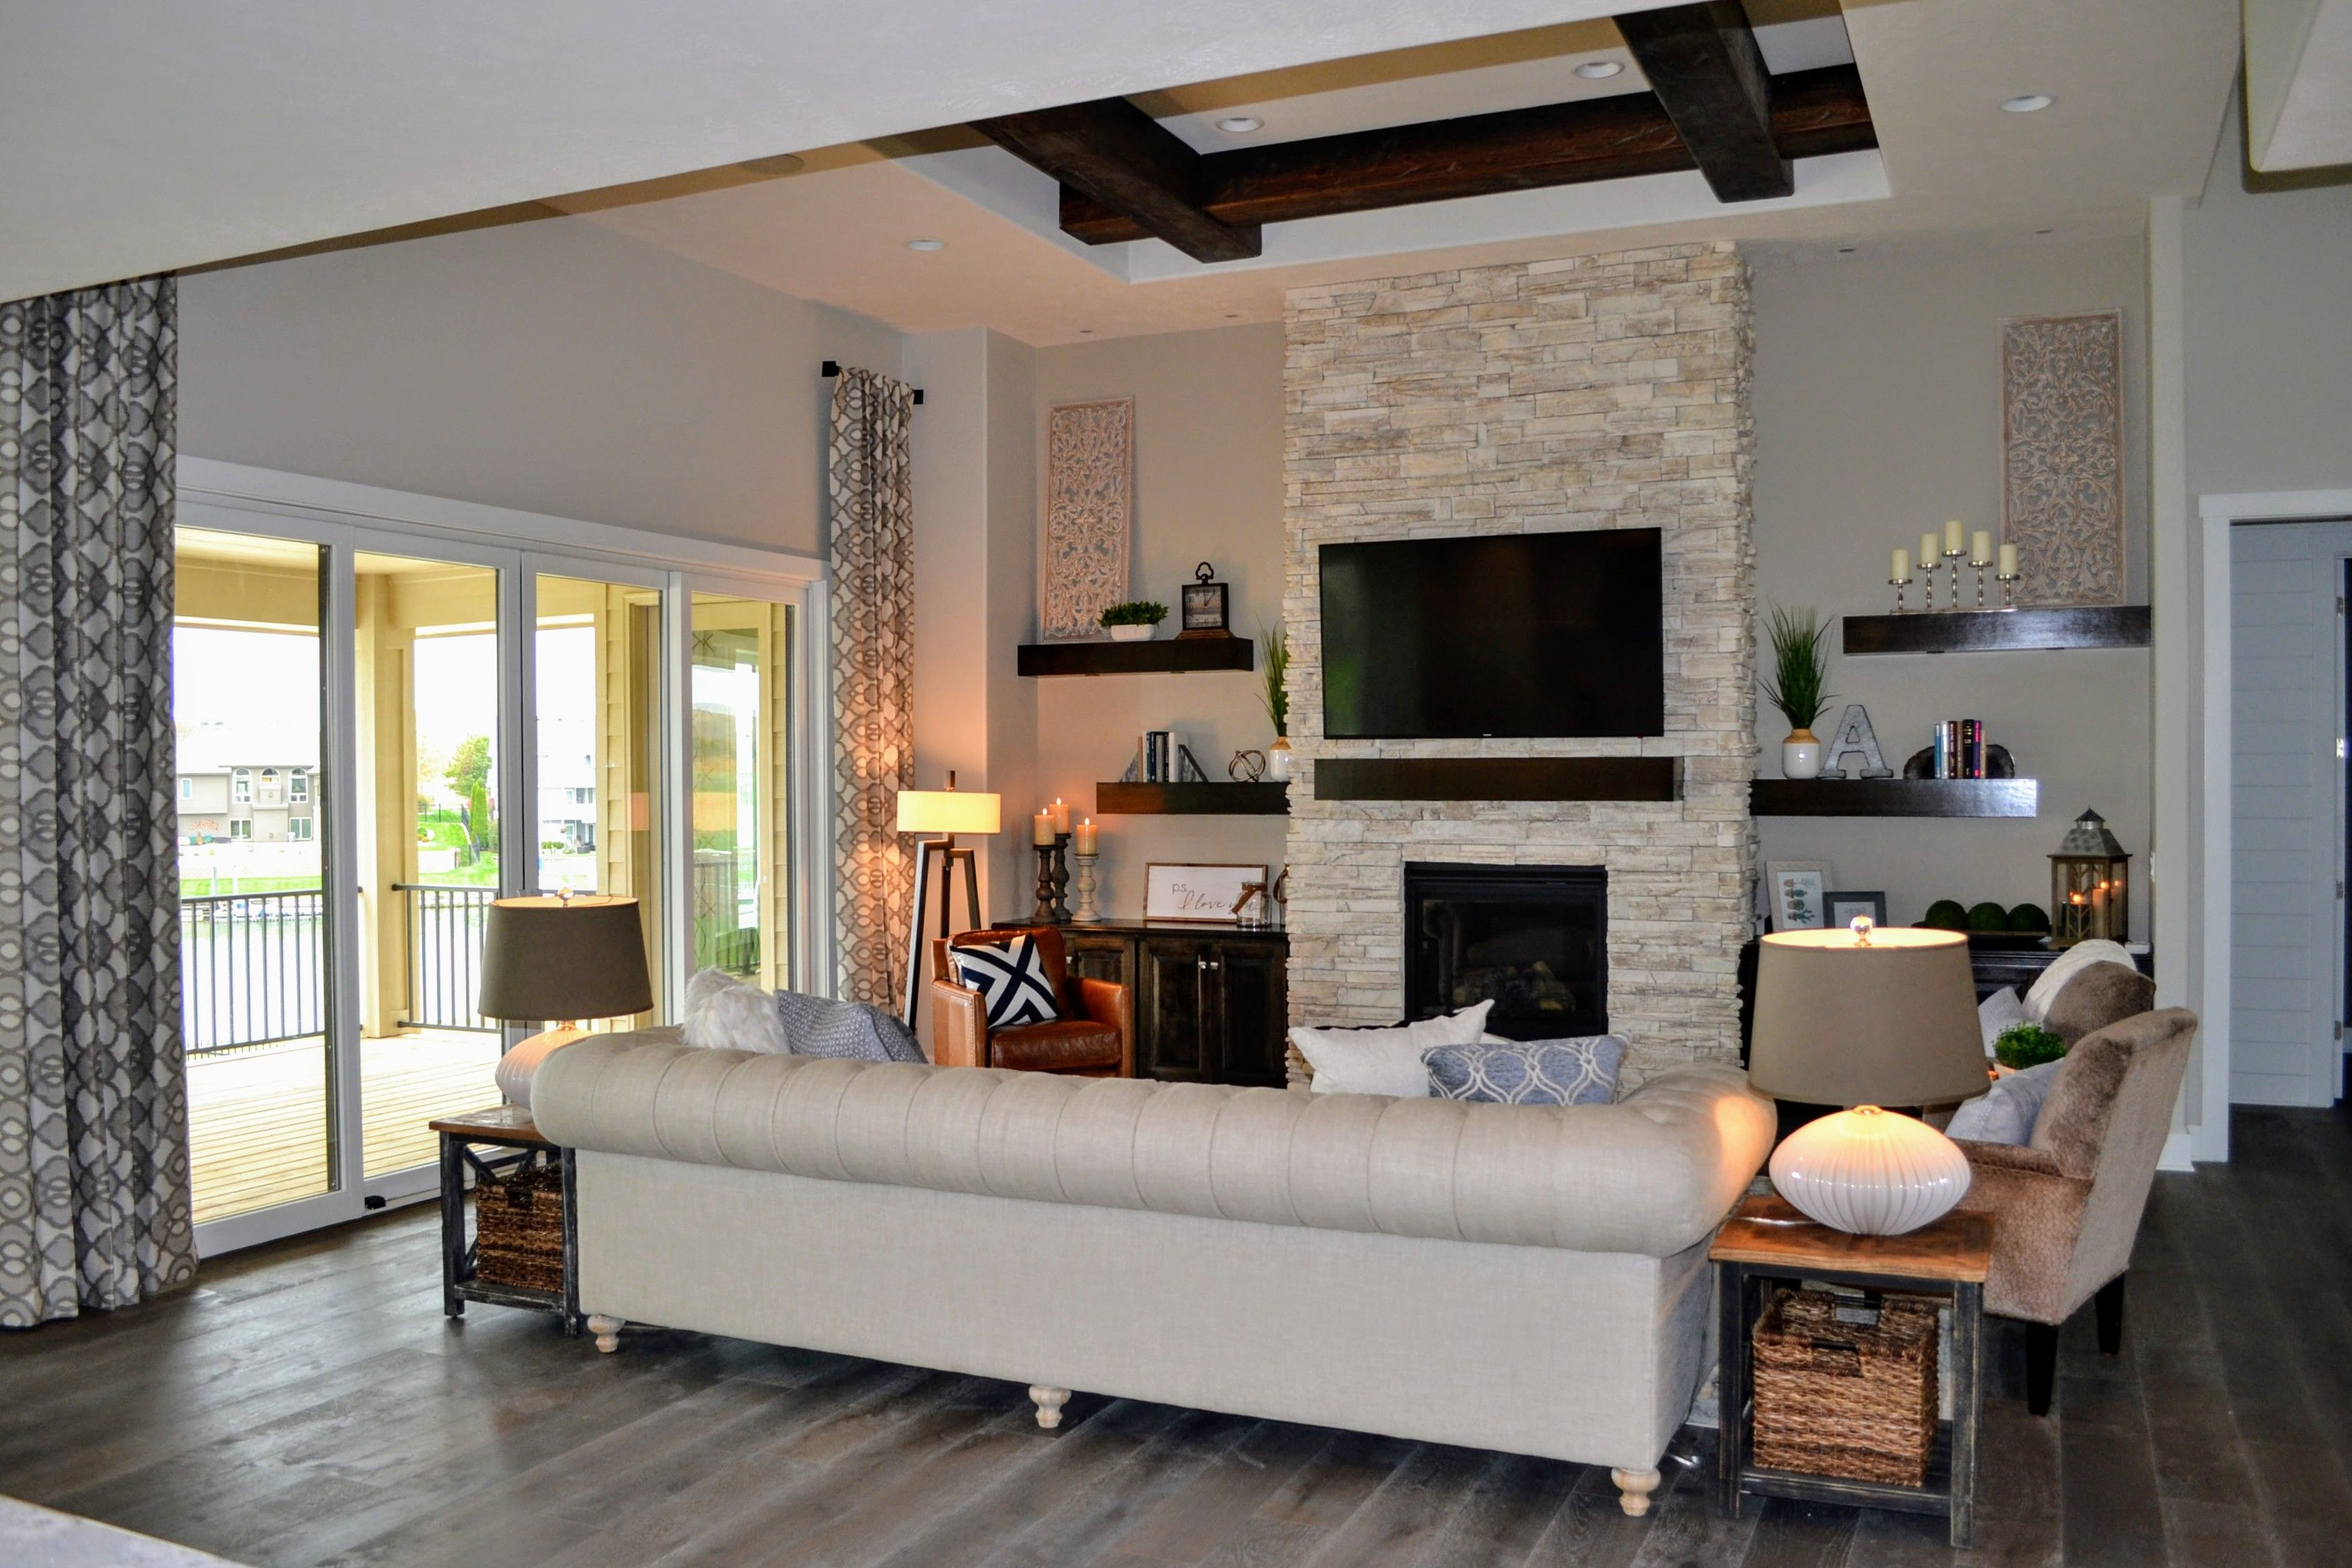 Best Modern Farmhouse Dream Home New Build Chesterfield Sofa 400 x 300